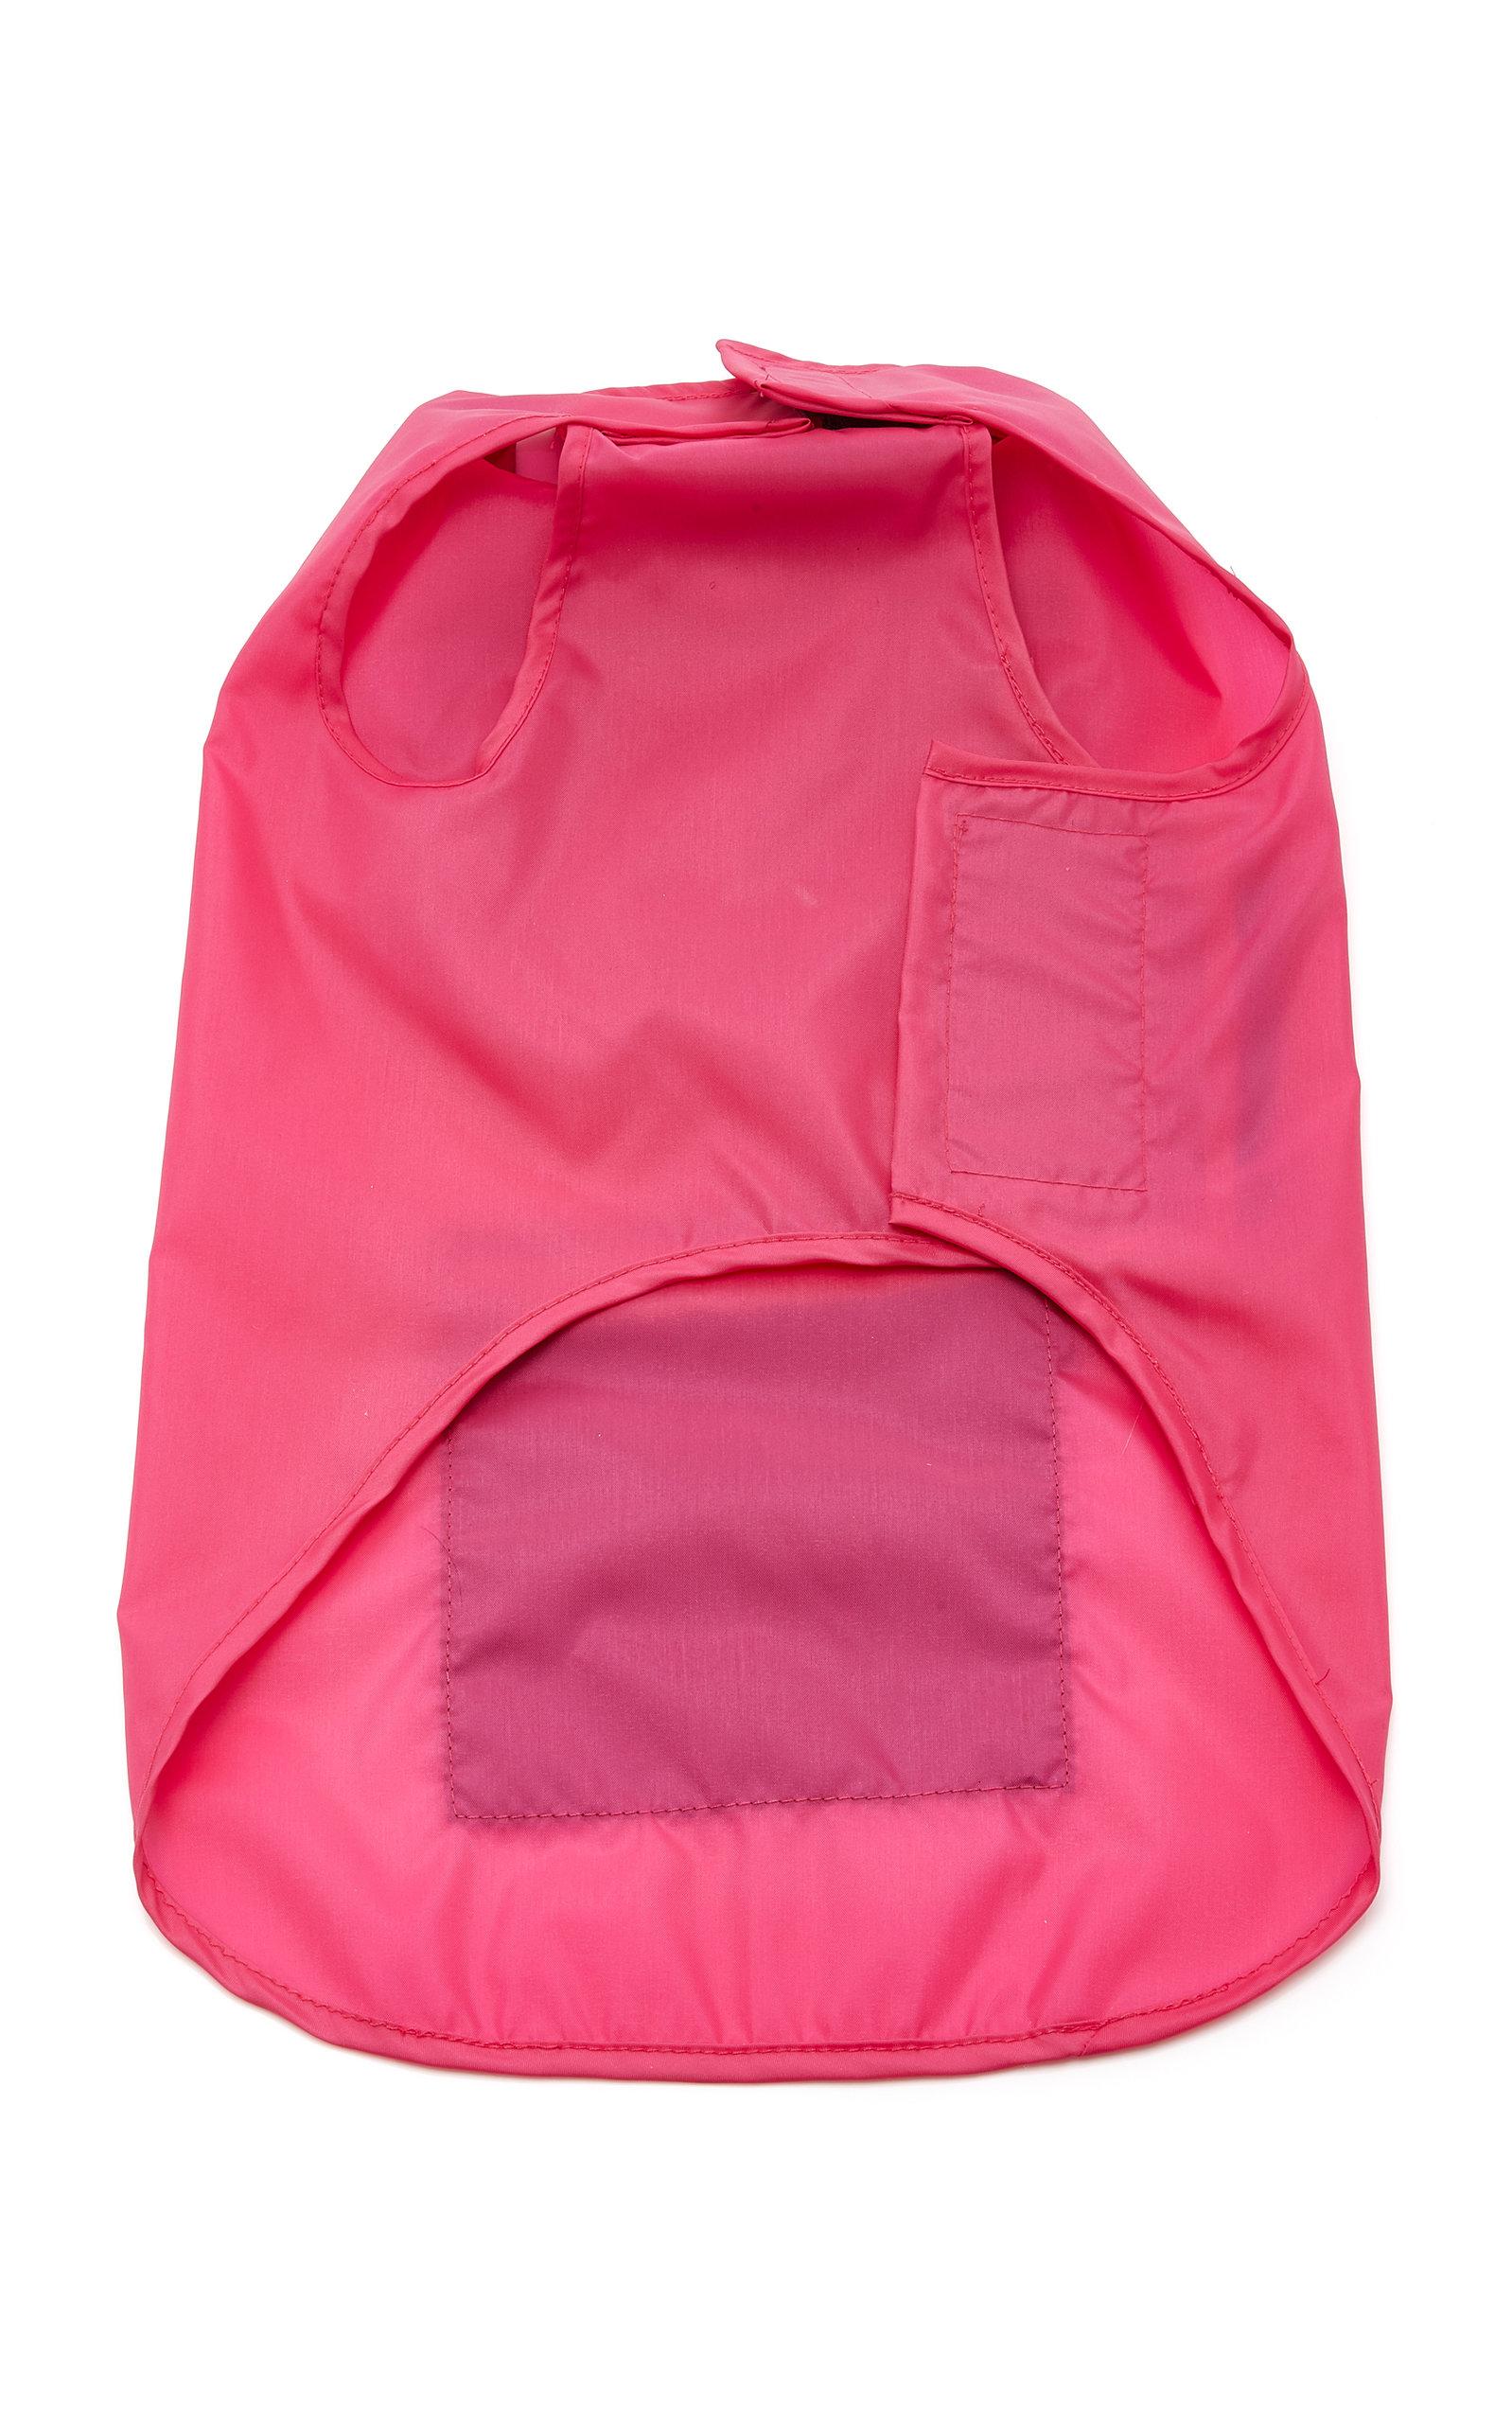 WARE OF DOG Large Colorblock Anorak Raincoat in Pink